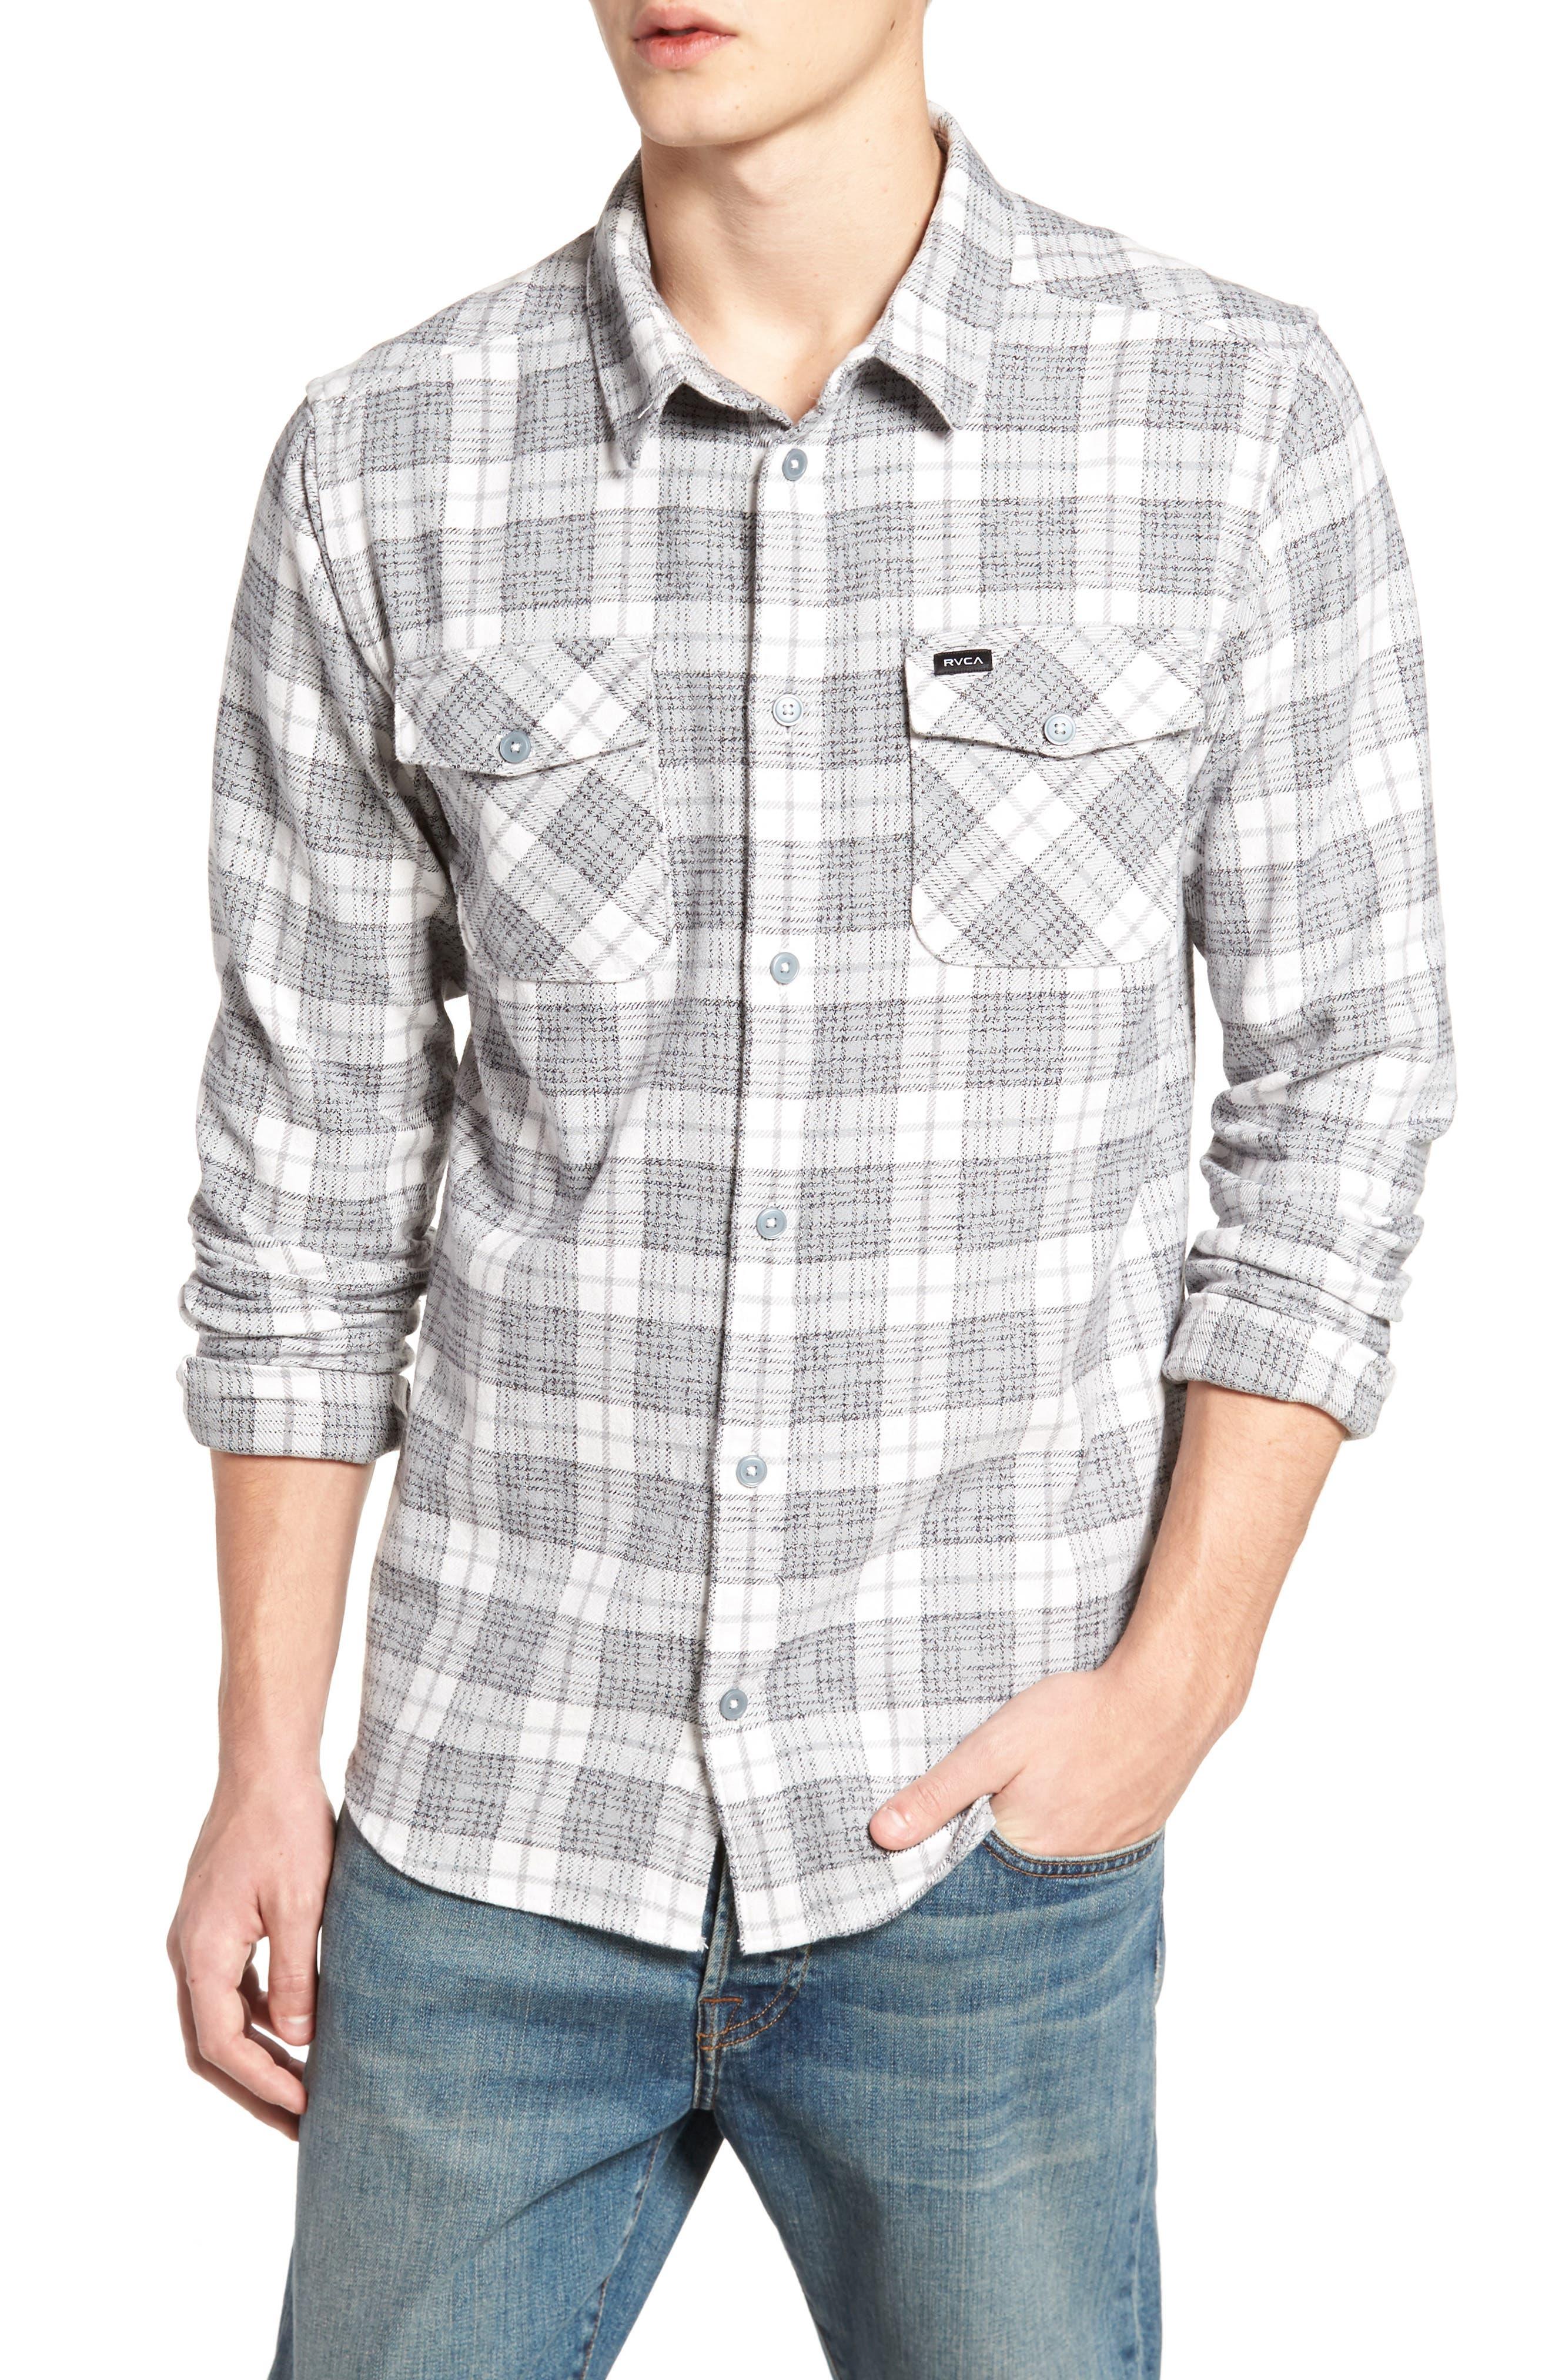 RVCA 'That'll Work' Trim Fit Plaid Flannel Shirt, Main, color, ANTIQUE WHITE